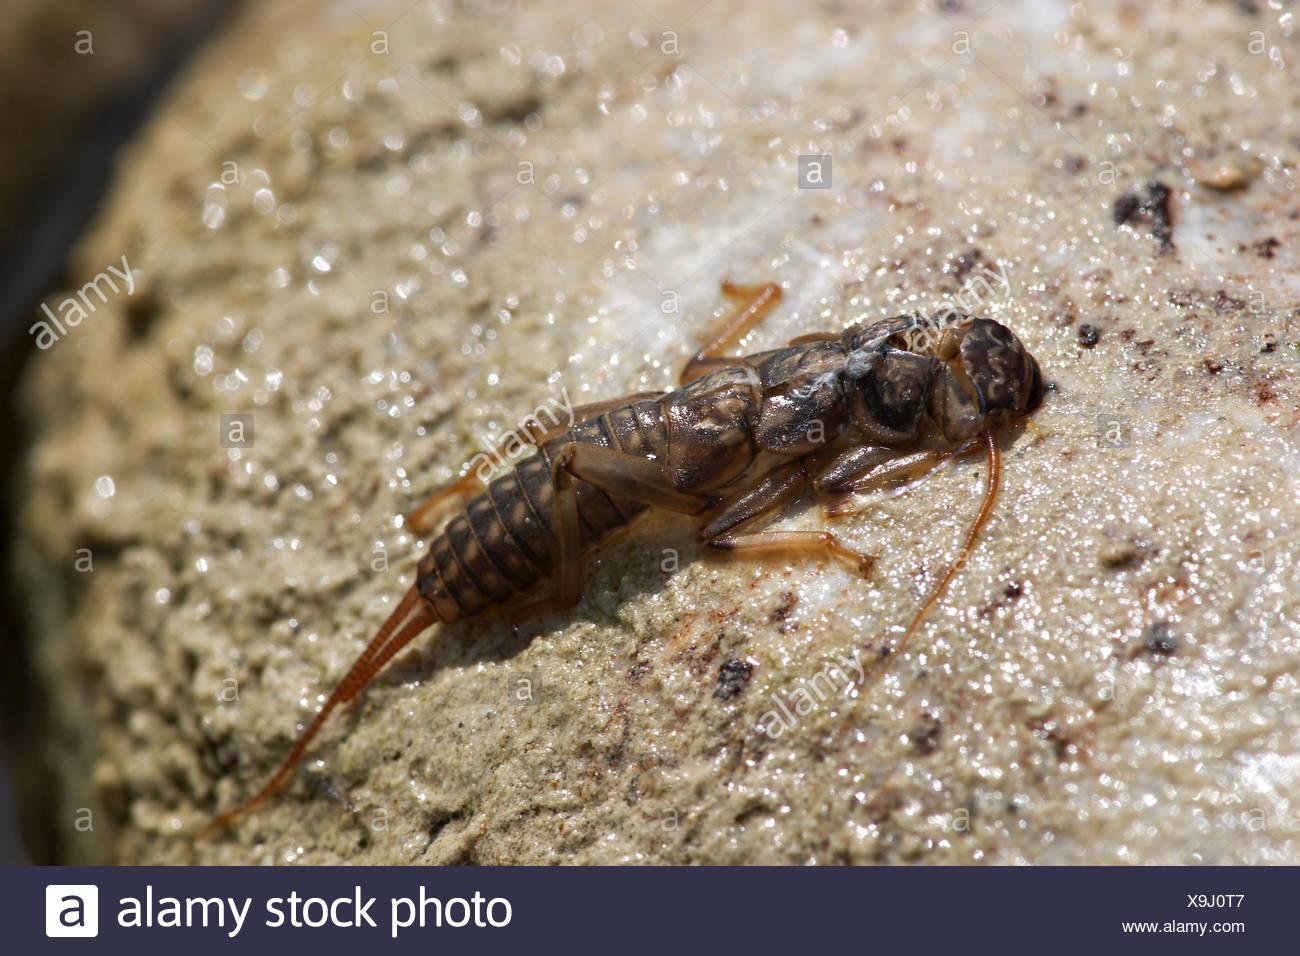 larva struck of stonefly Plecoptera - Stock Image